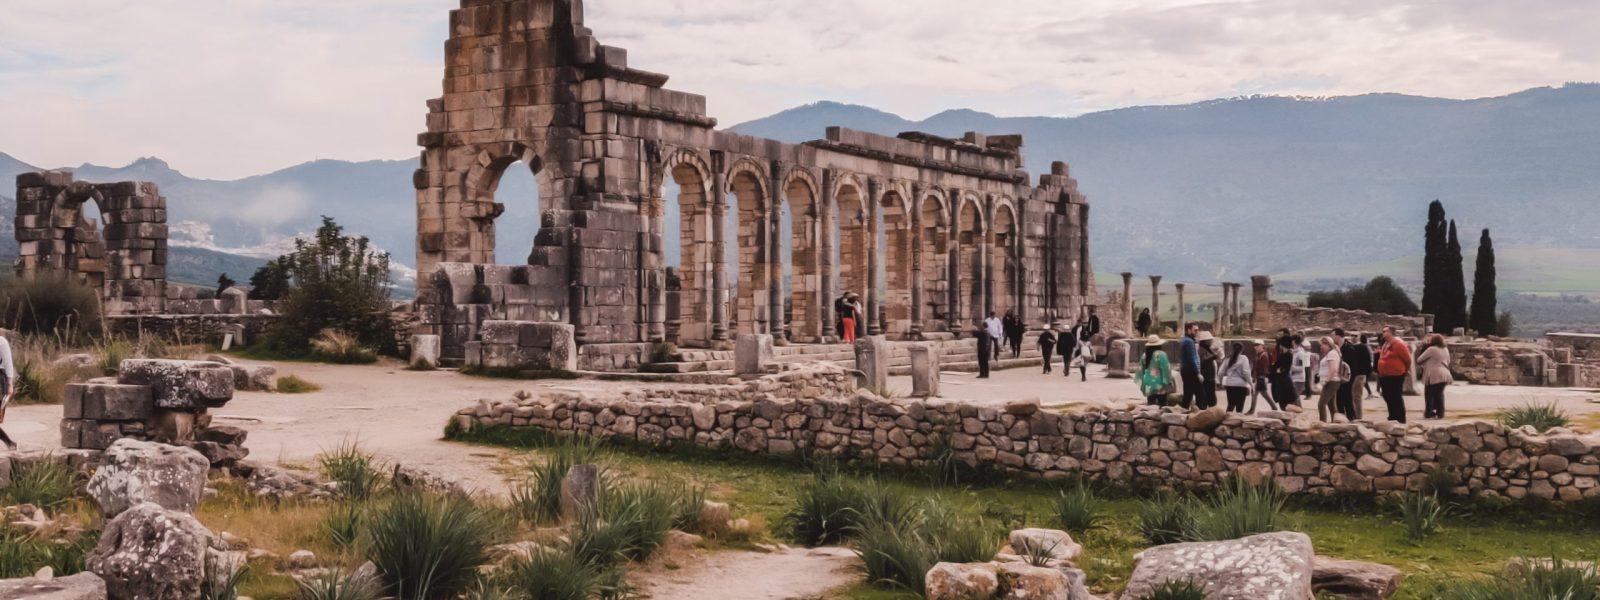 Volubilis: Romeinse ruïnes in Marokko (+ praktische kaart)